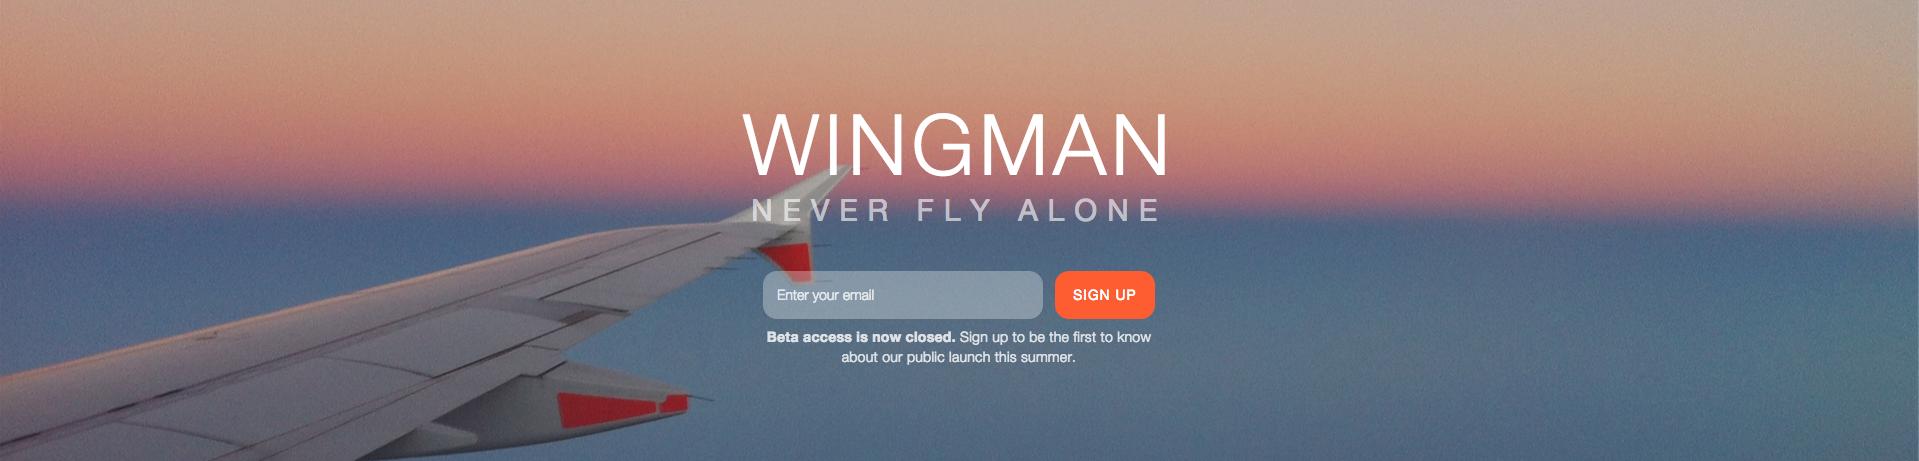 188220 wingman 7a0c32 original 1448374773